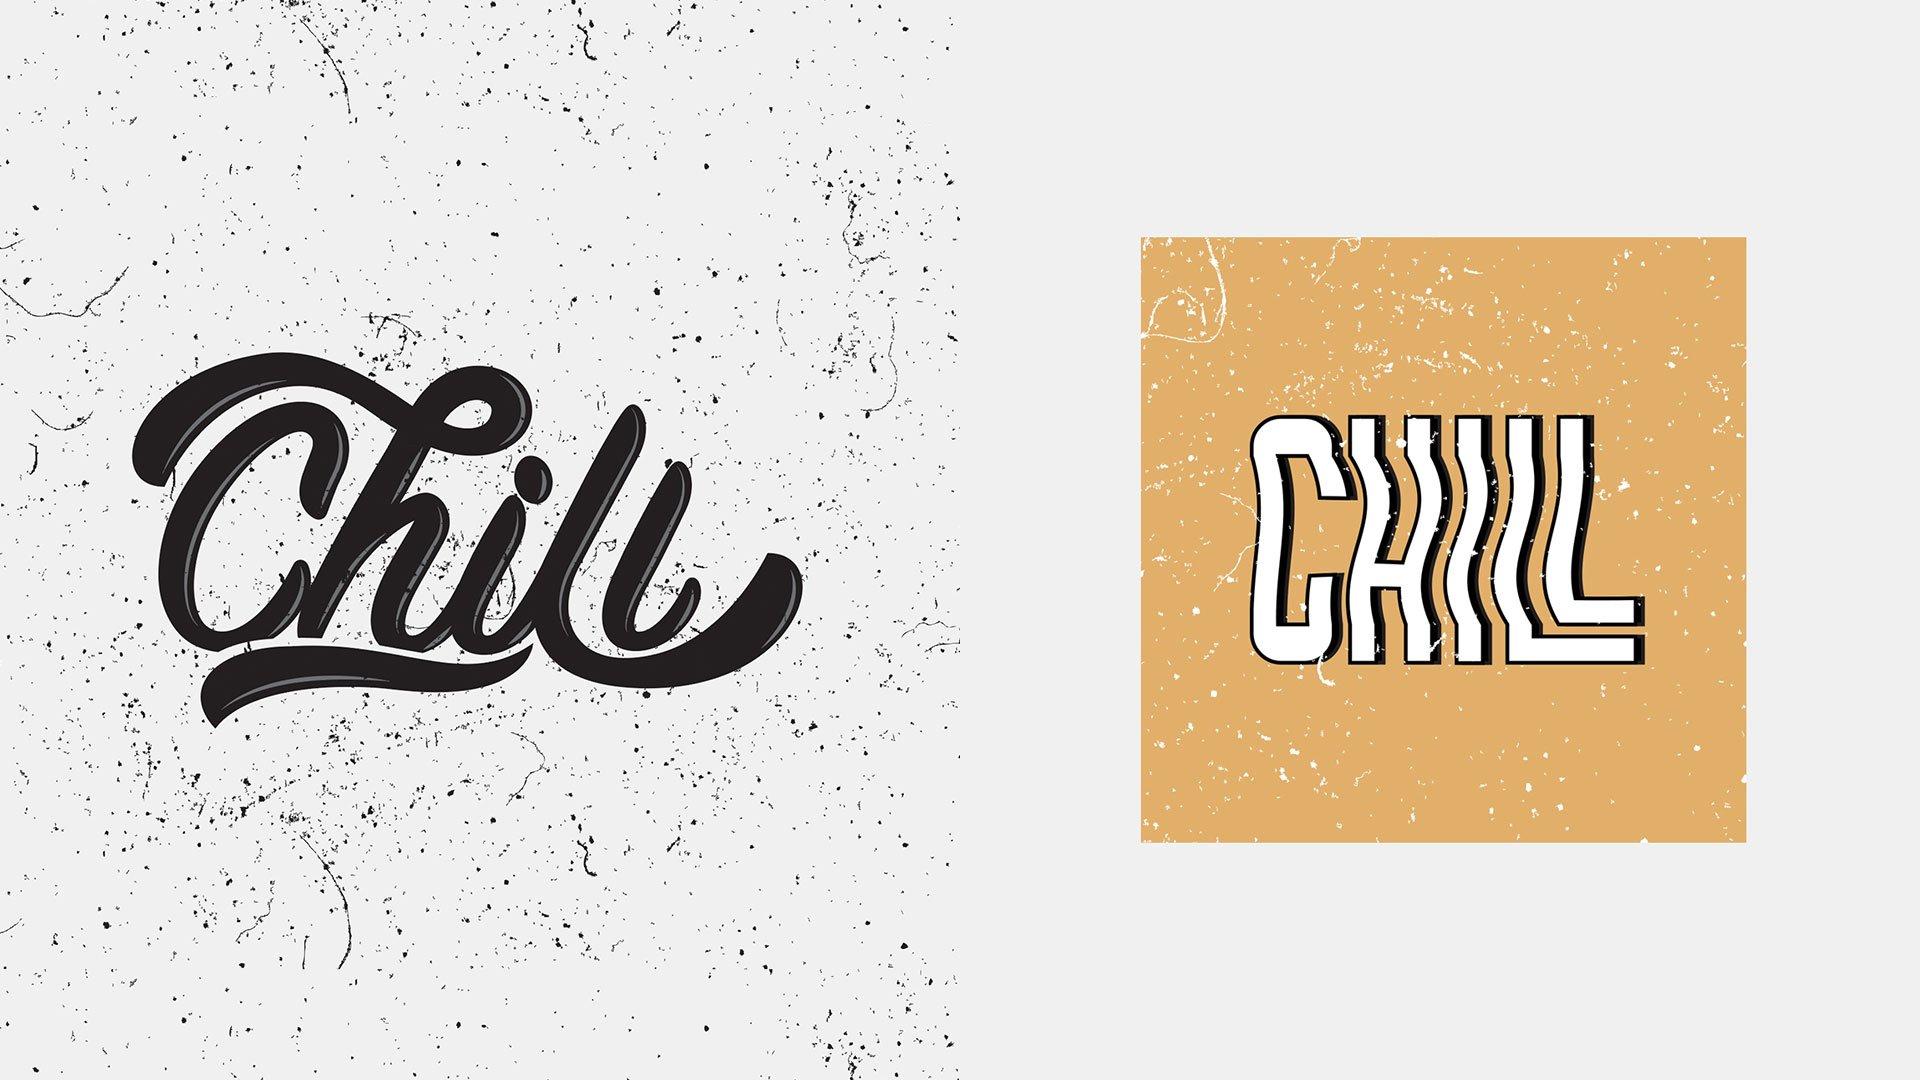 Chill-2